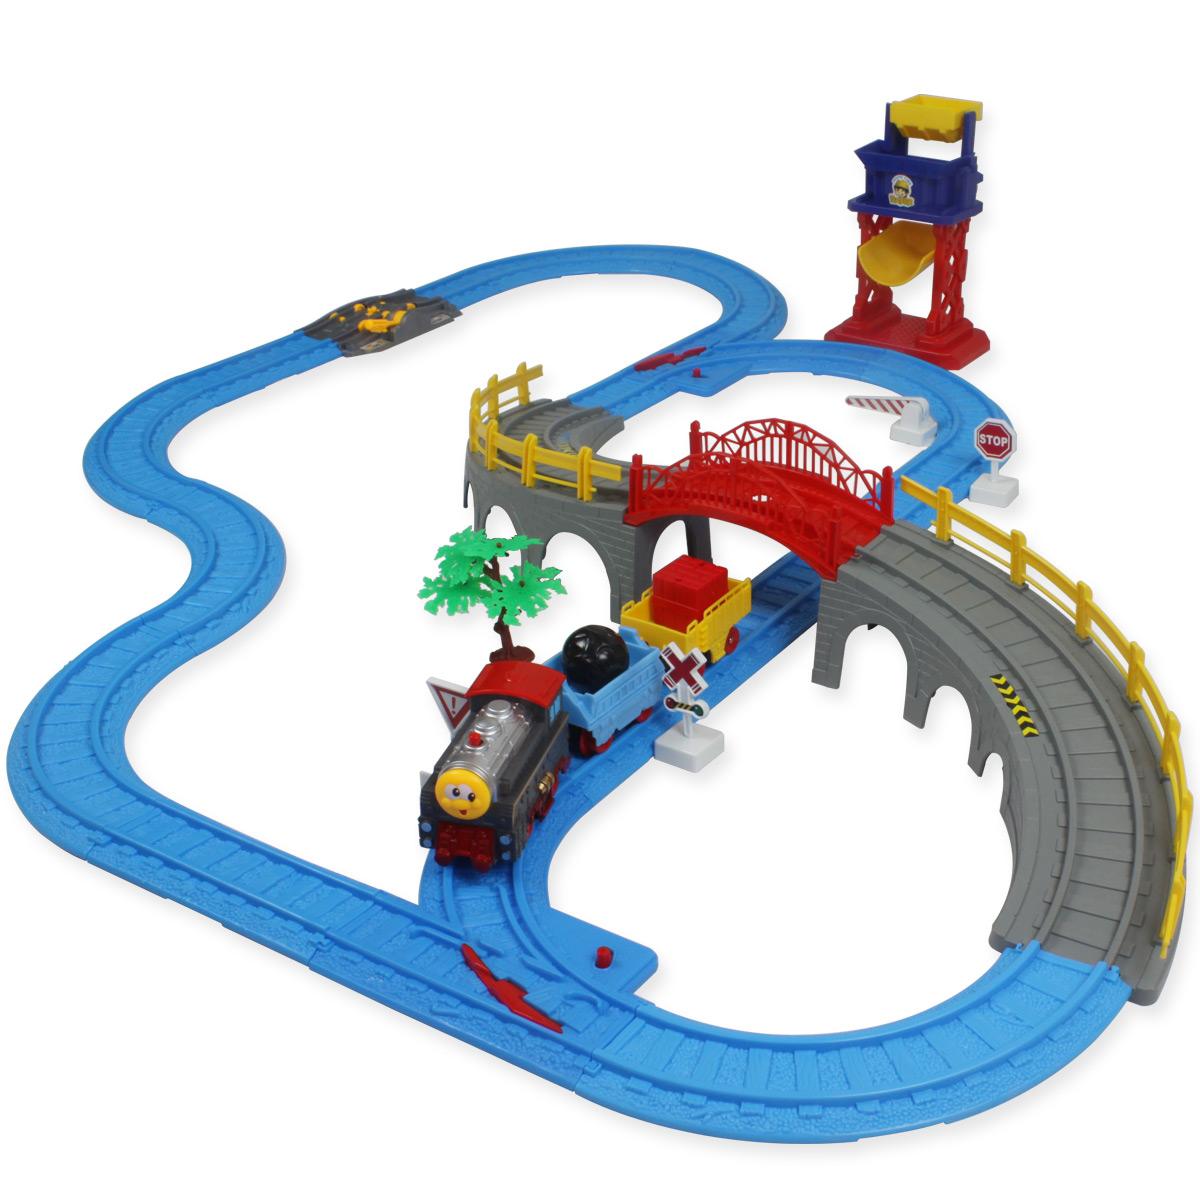 Thomas the train toy value